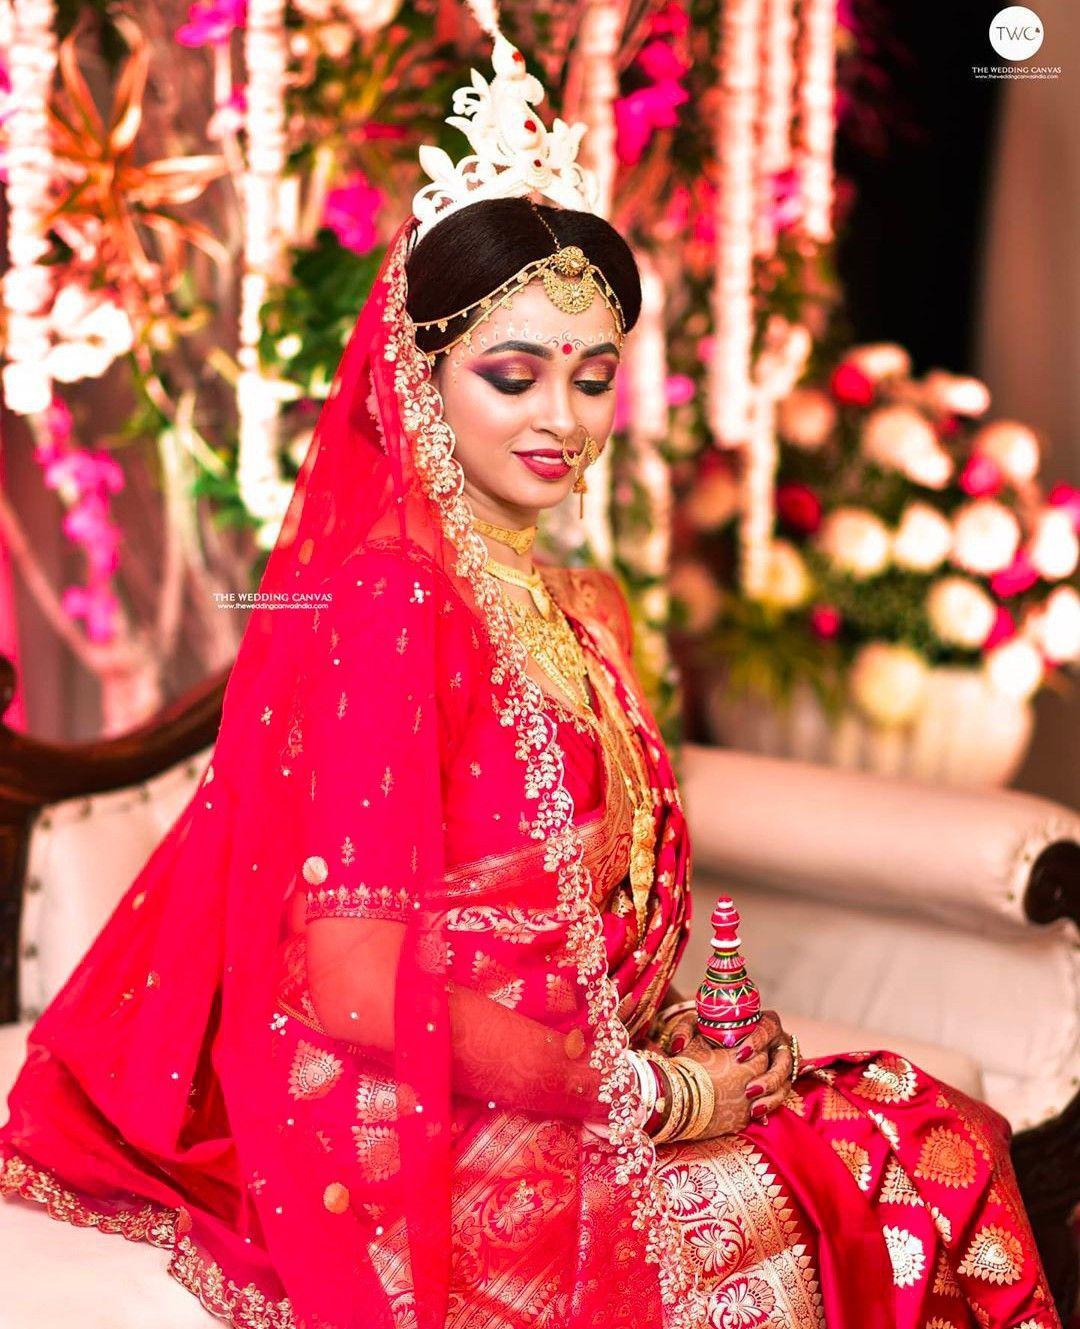 Pin By Harveen Alg On Meti Ke Kushboo In 2020 Bengali Bridal Makeup Indian Silk Sarees Indian Wedding Photography